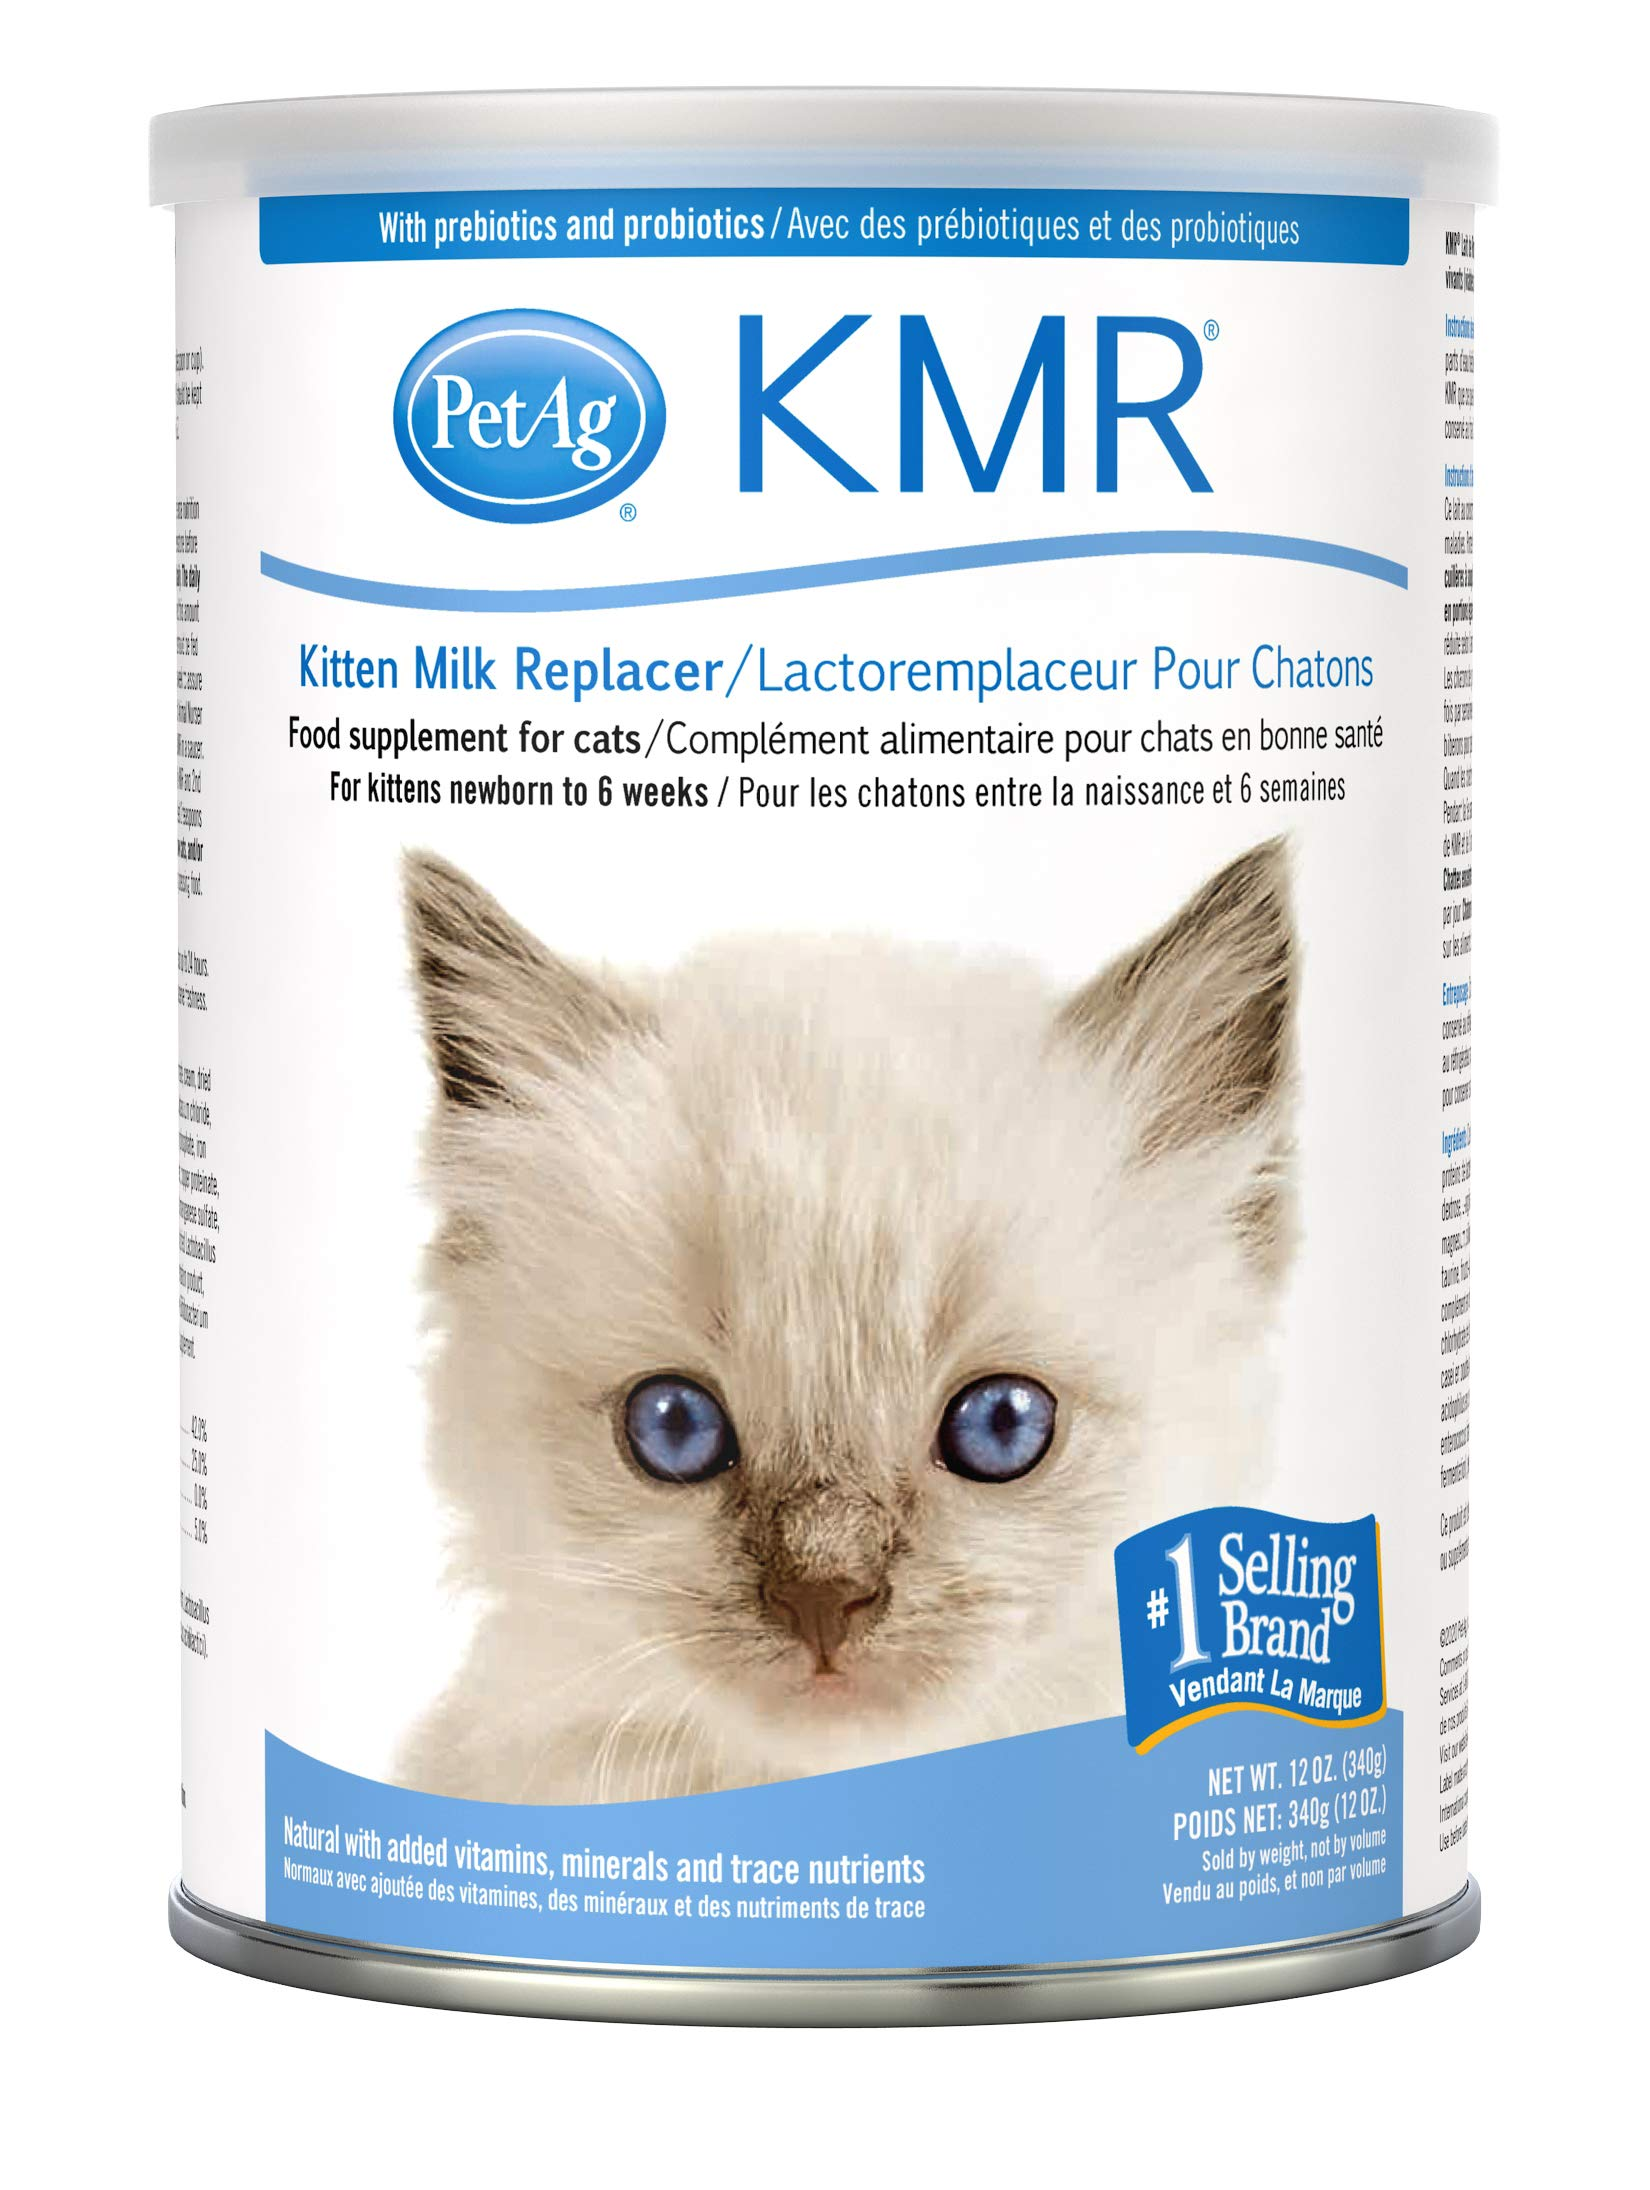 PetAg KMR Kitten Milk Replacer Powder - Prebiotics and Probiotics - Newborn to Six Weeks - Kitten Formula - 12 oz